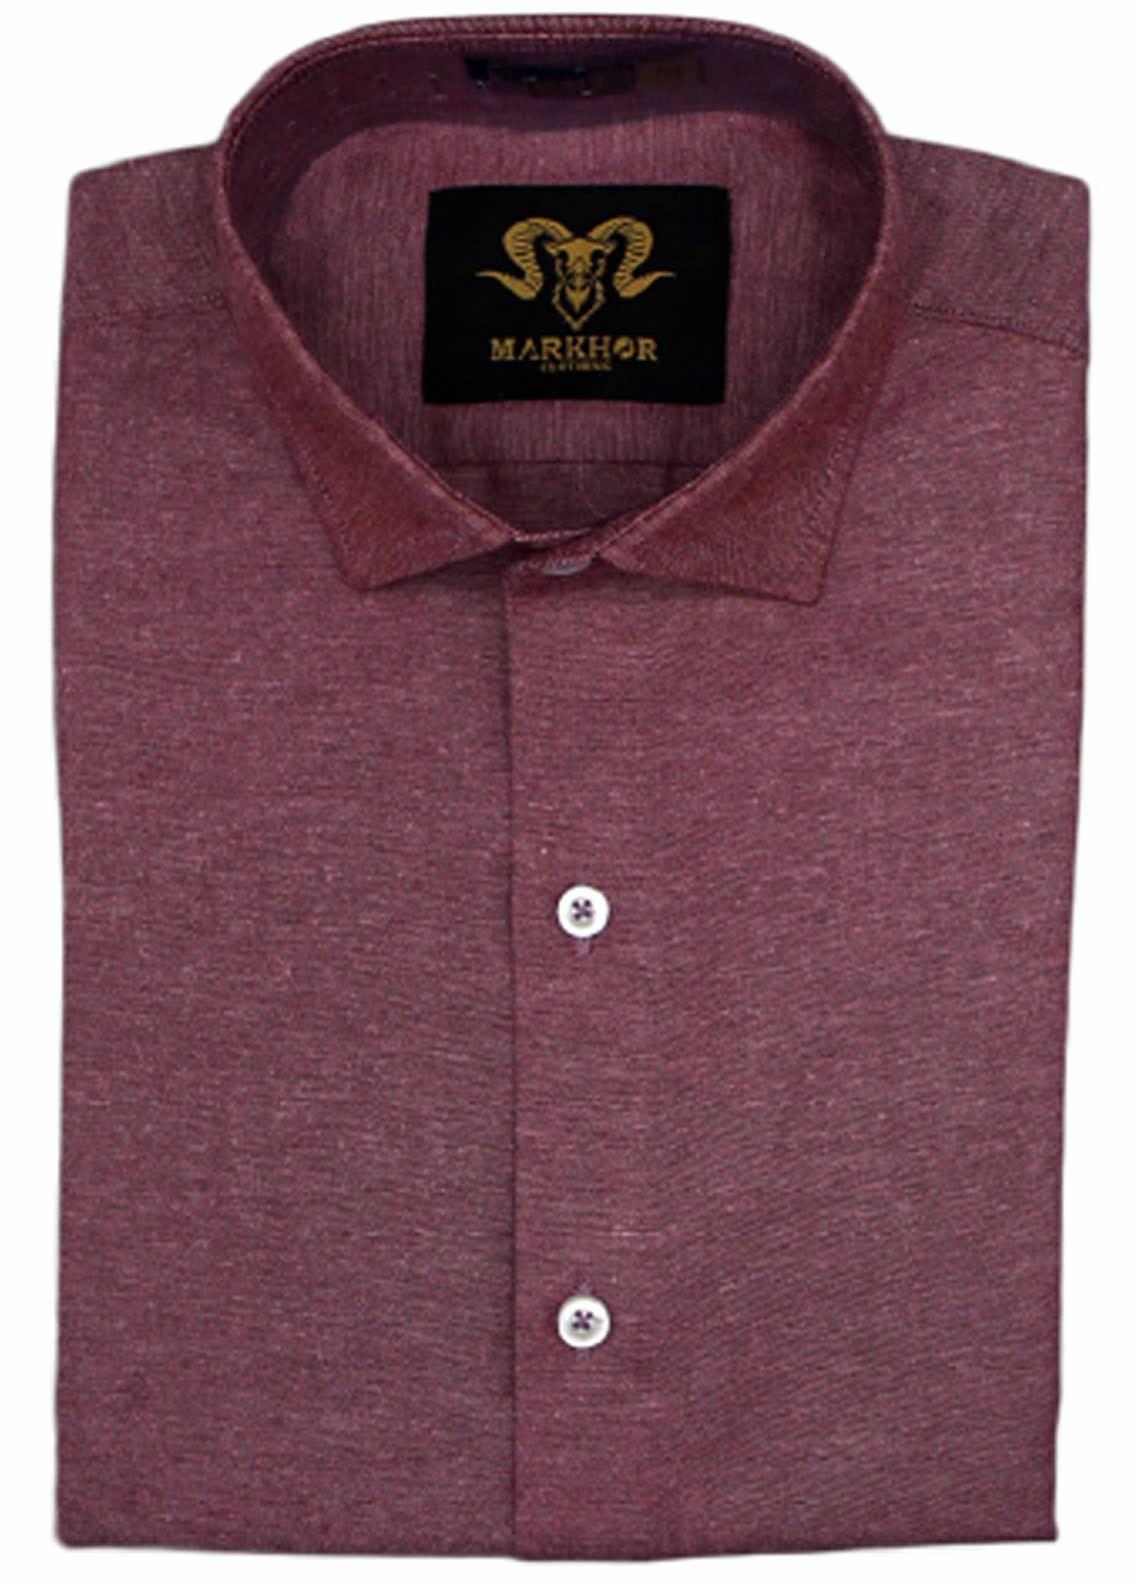 Markhor Clothing Chambray Cotton Formal Men Shirts - Burgundy  Chambray Cotton Slim Fit Formal Shirt